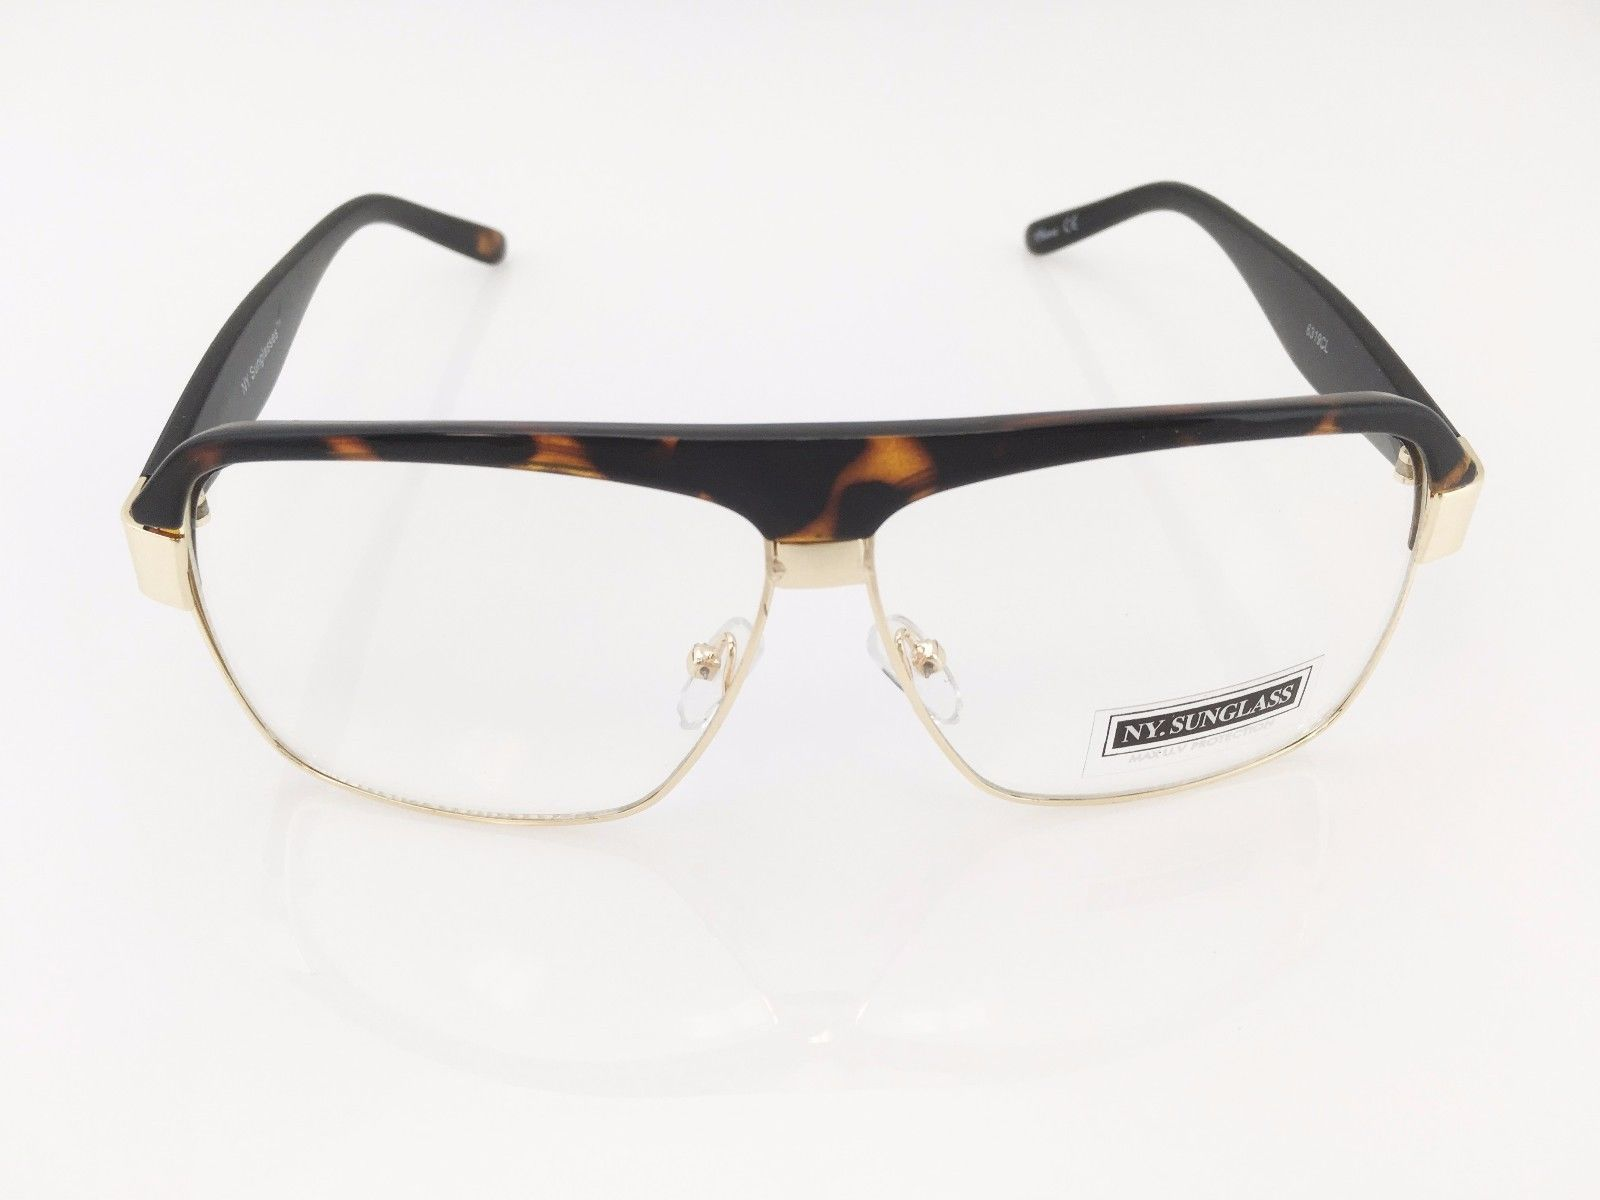 CLASSIC VINTAGE RETRO AVIATOR Style Clear Lens EYE GLASSES ...